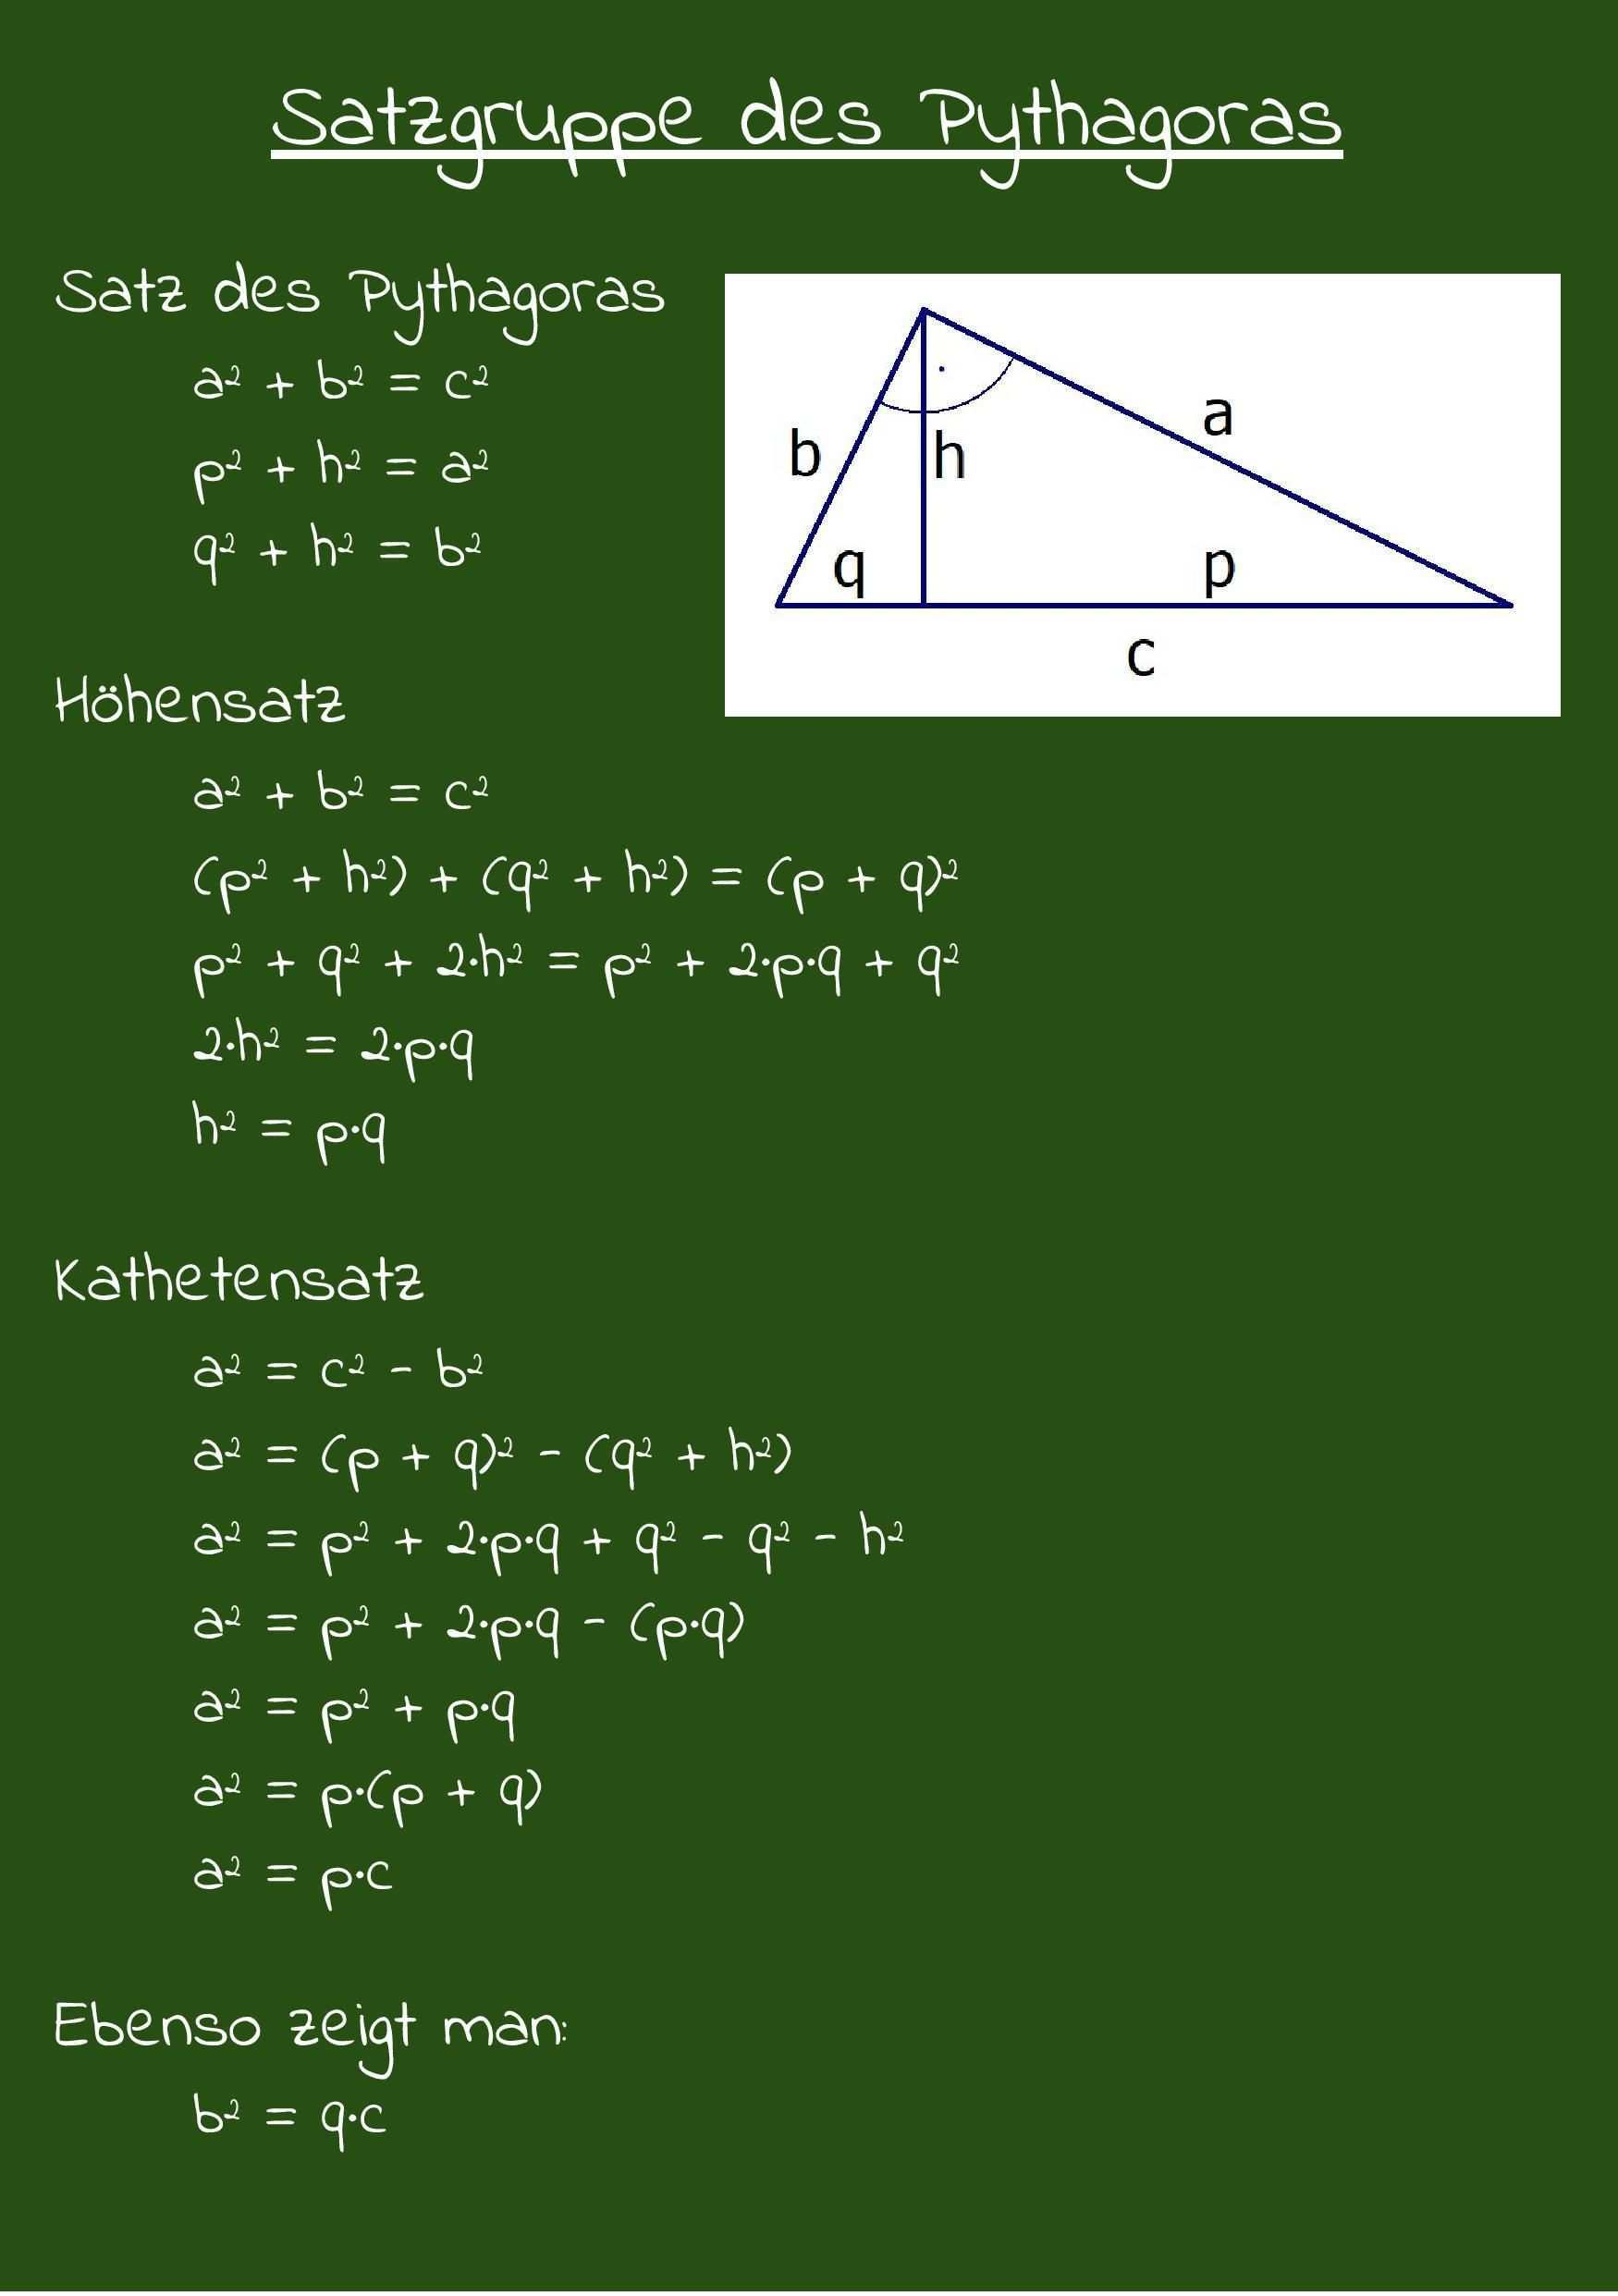 Satzgruppe Des Pythagoras Satz Des Pythagoras Hohensatz Kathetensatz Satz Des Pythagoras Nachhilfe Mathe Mathe Formeln